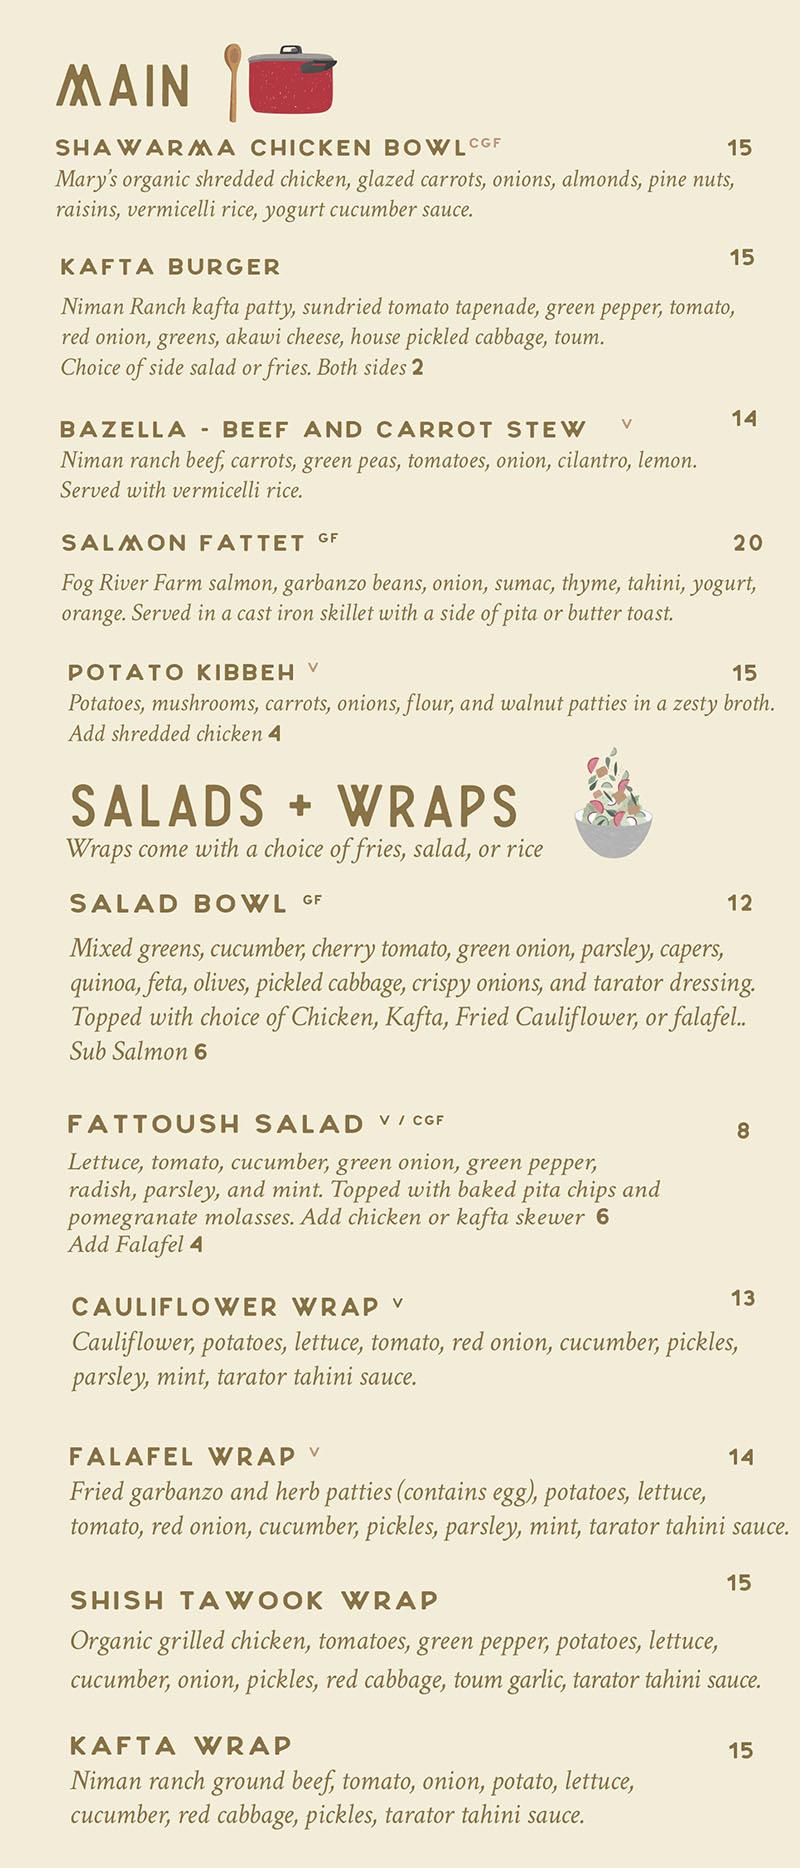 Laziz Kitchen dinner menu - mains, salads, wraps